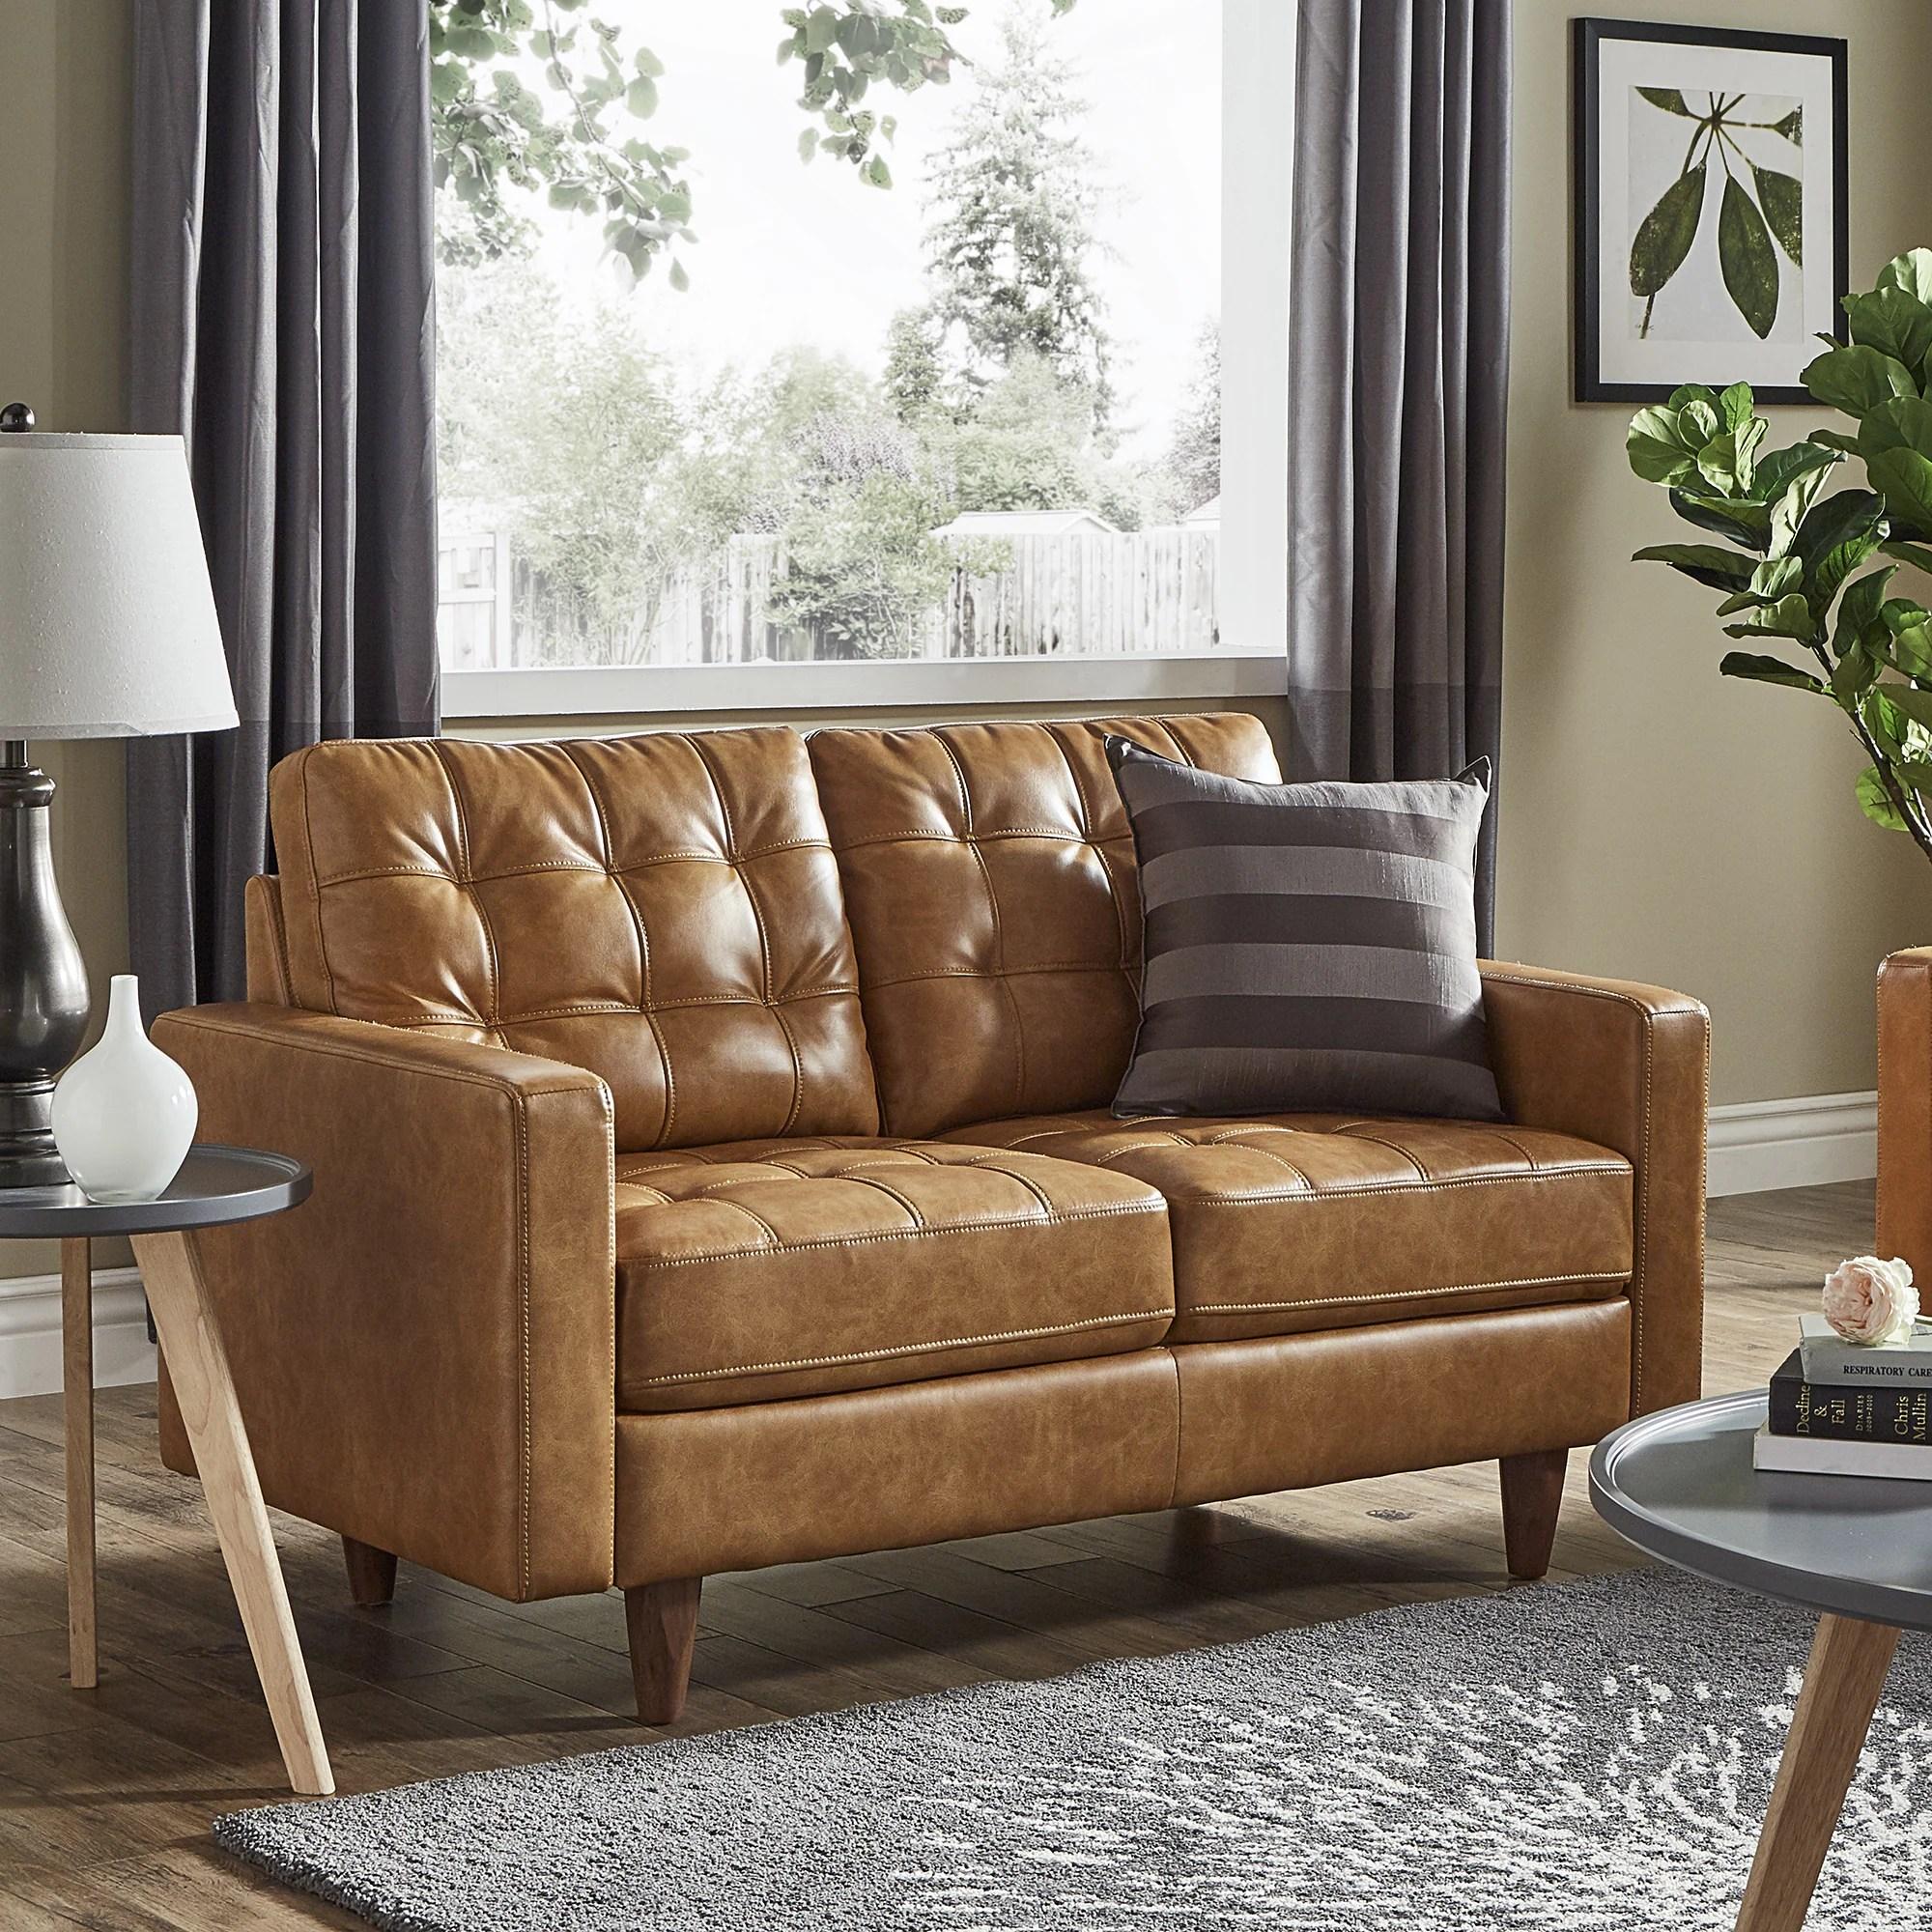 caramel colored leather sofas burlington sofa laura ashley carmel couch